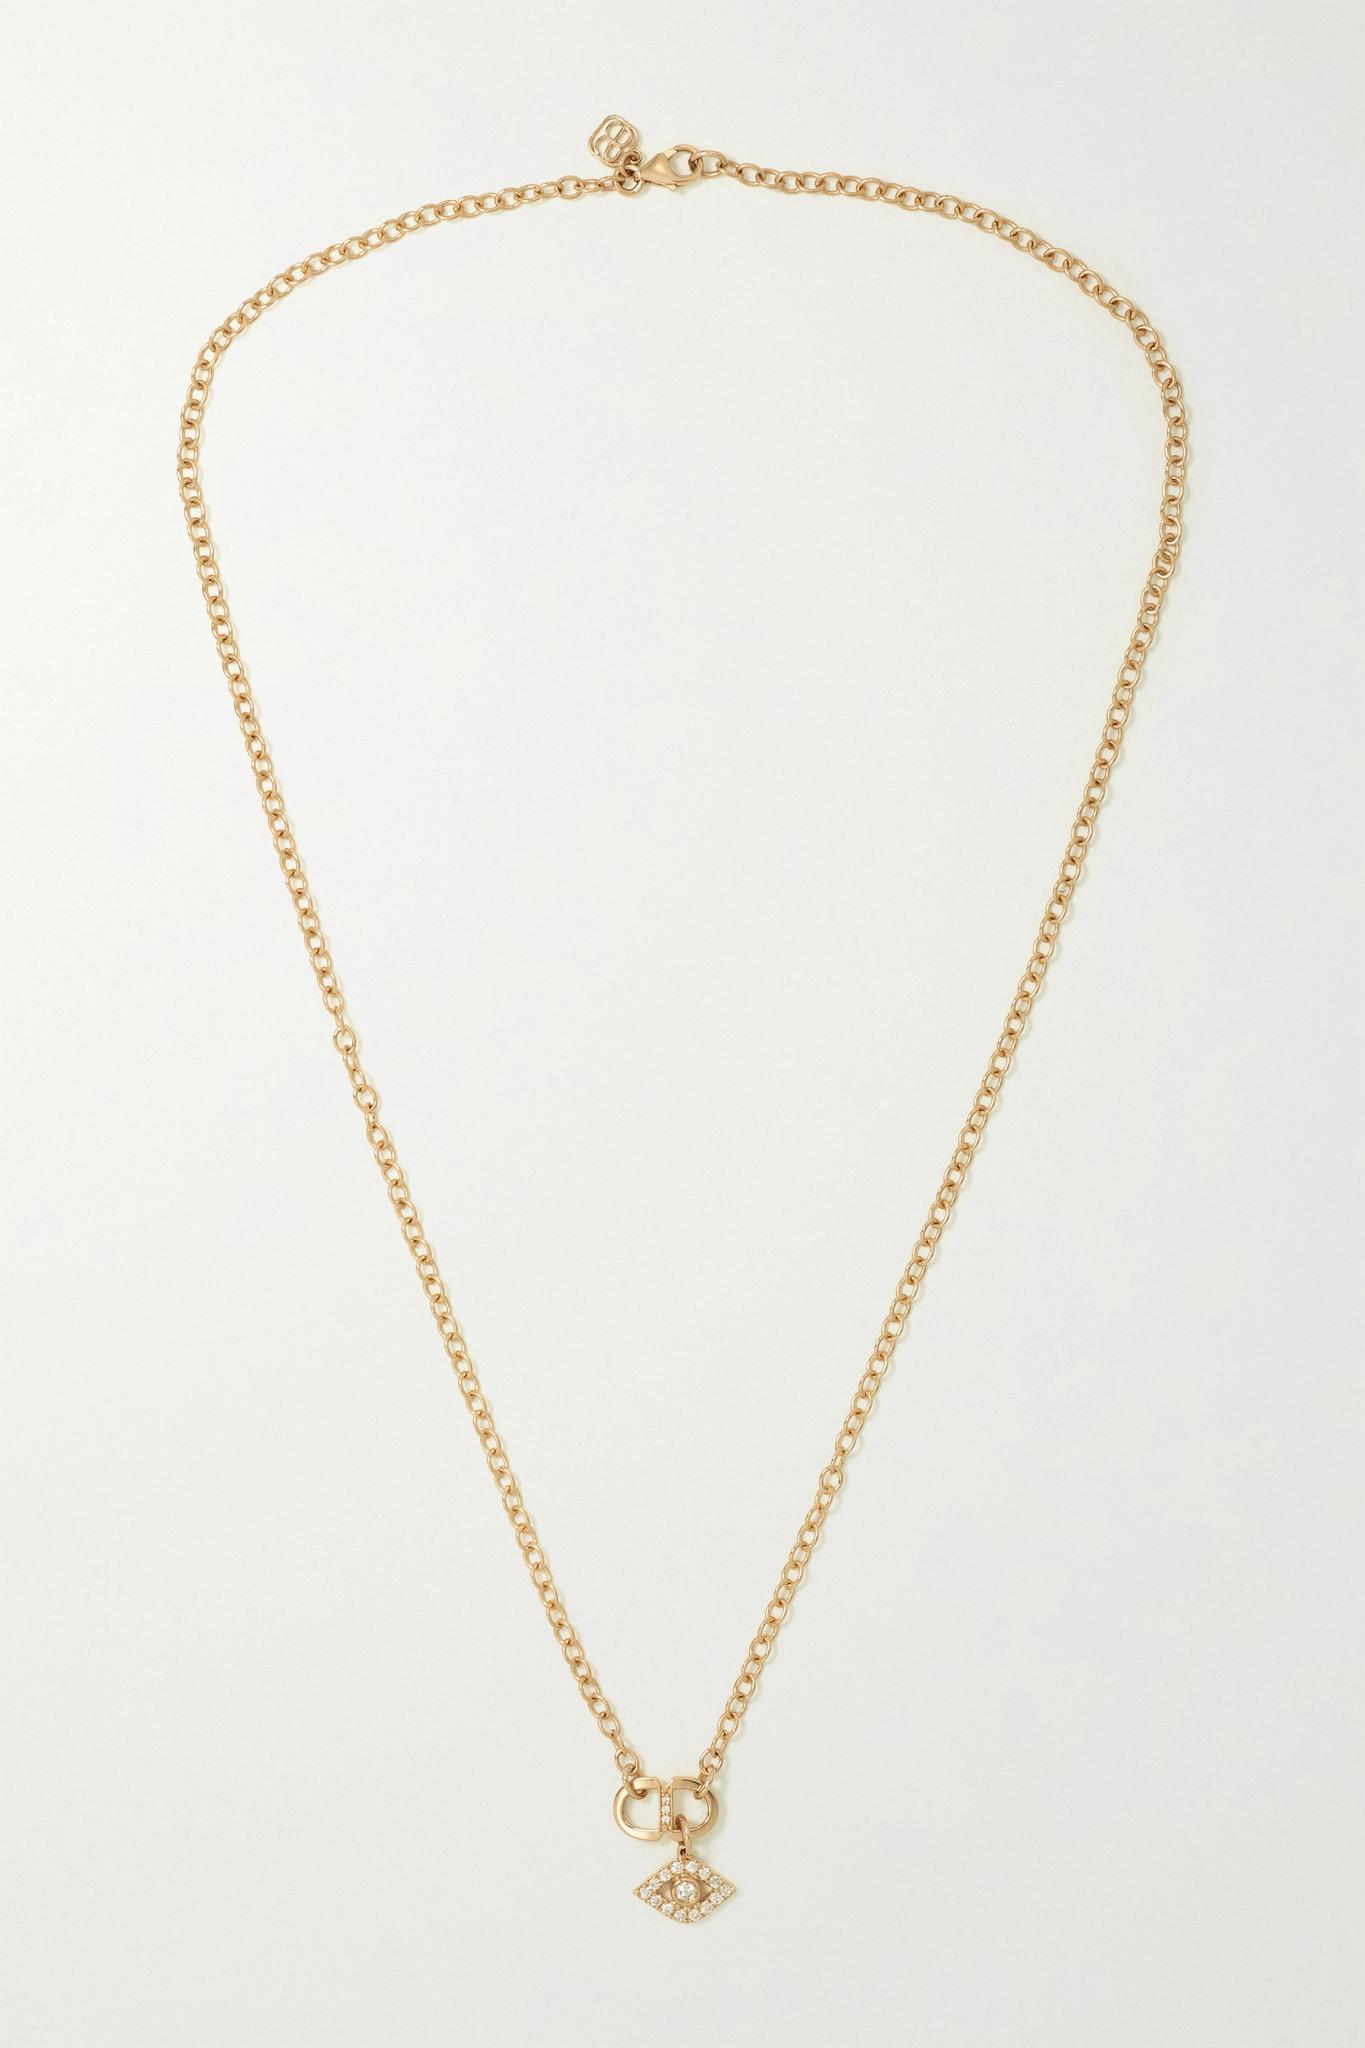 SYDNEY EVAN - Evil Eye 14-karat Gold Diamond Necklace - one size